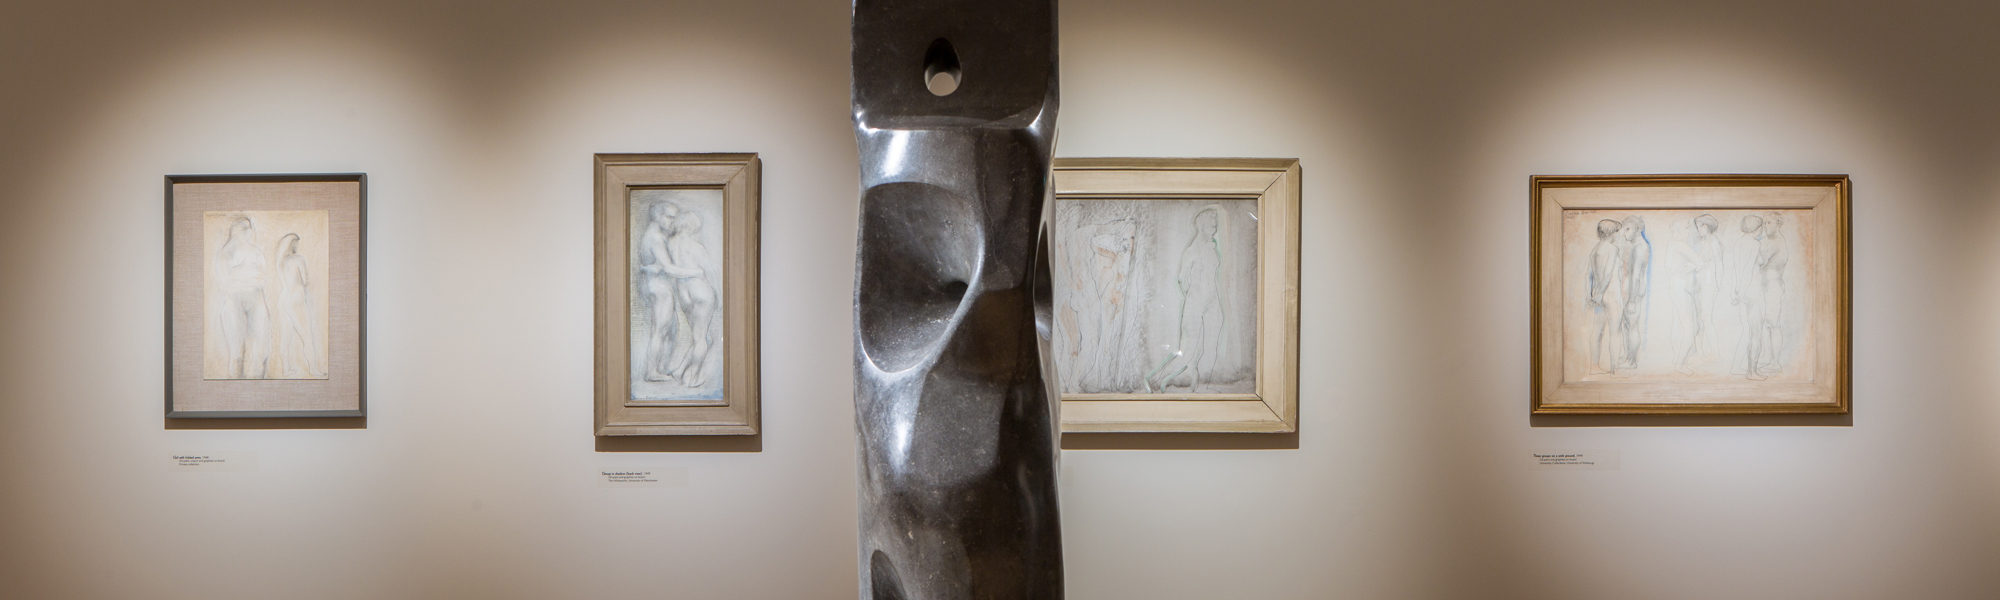 UHArts, Barbara Hepworth, artist in society 1948-53, Hepworth, Rob Harris